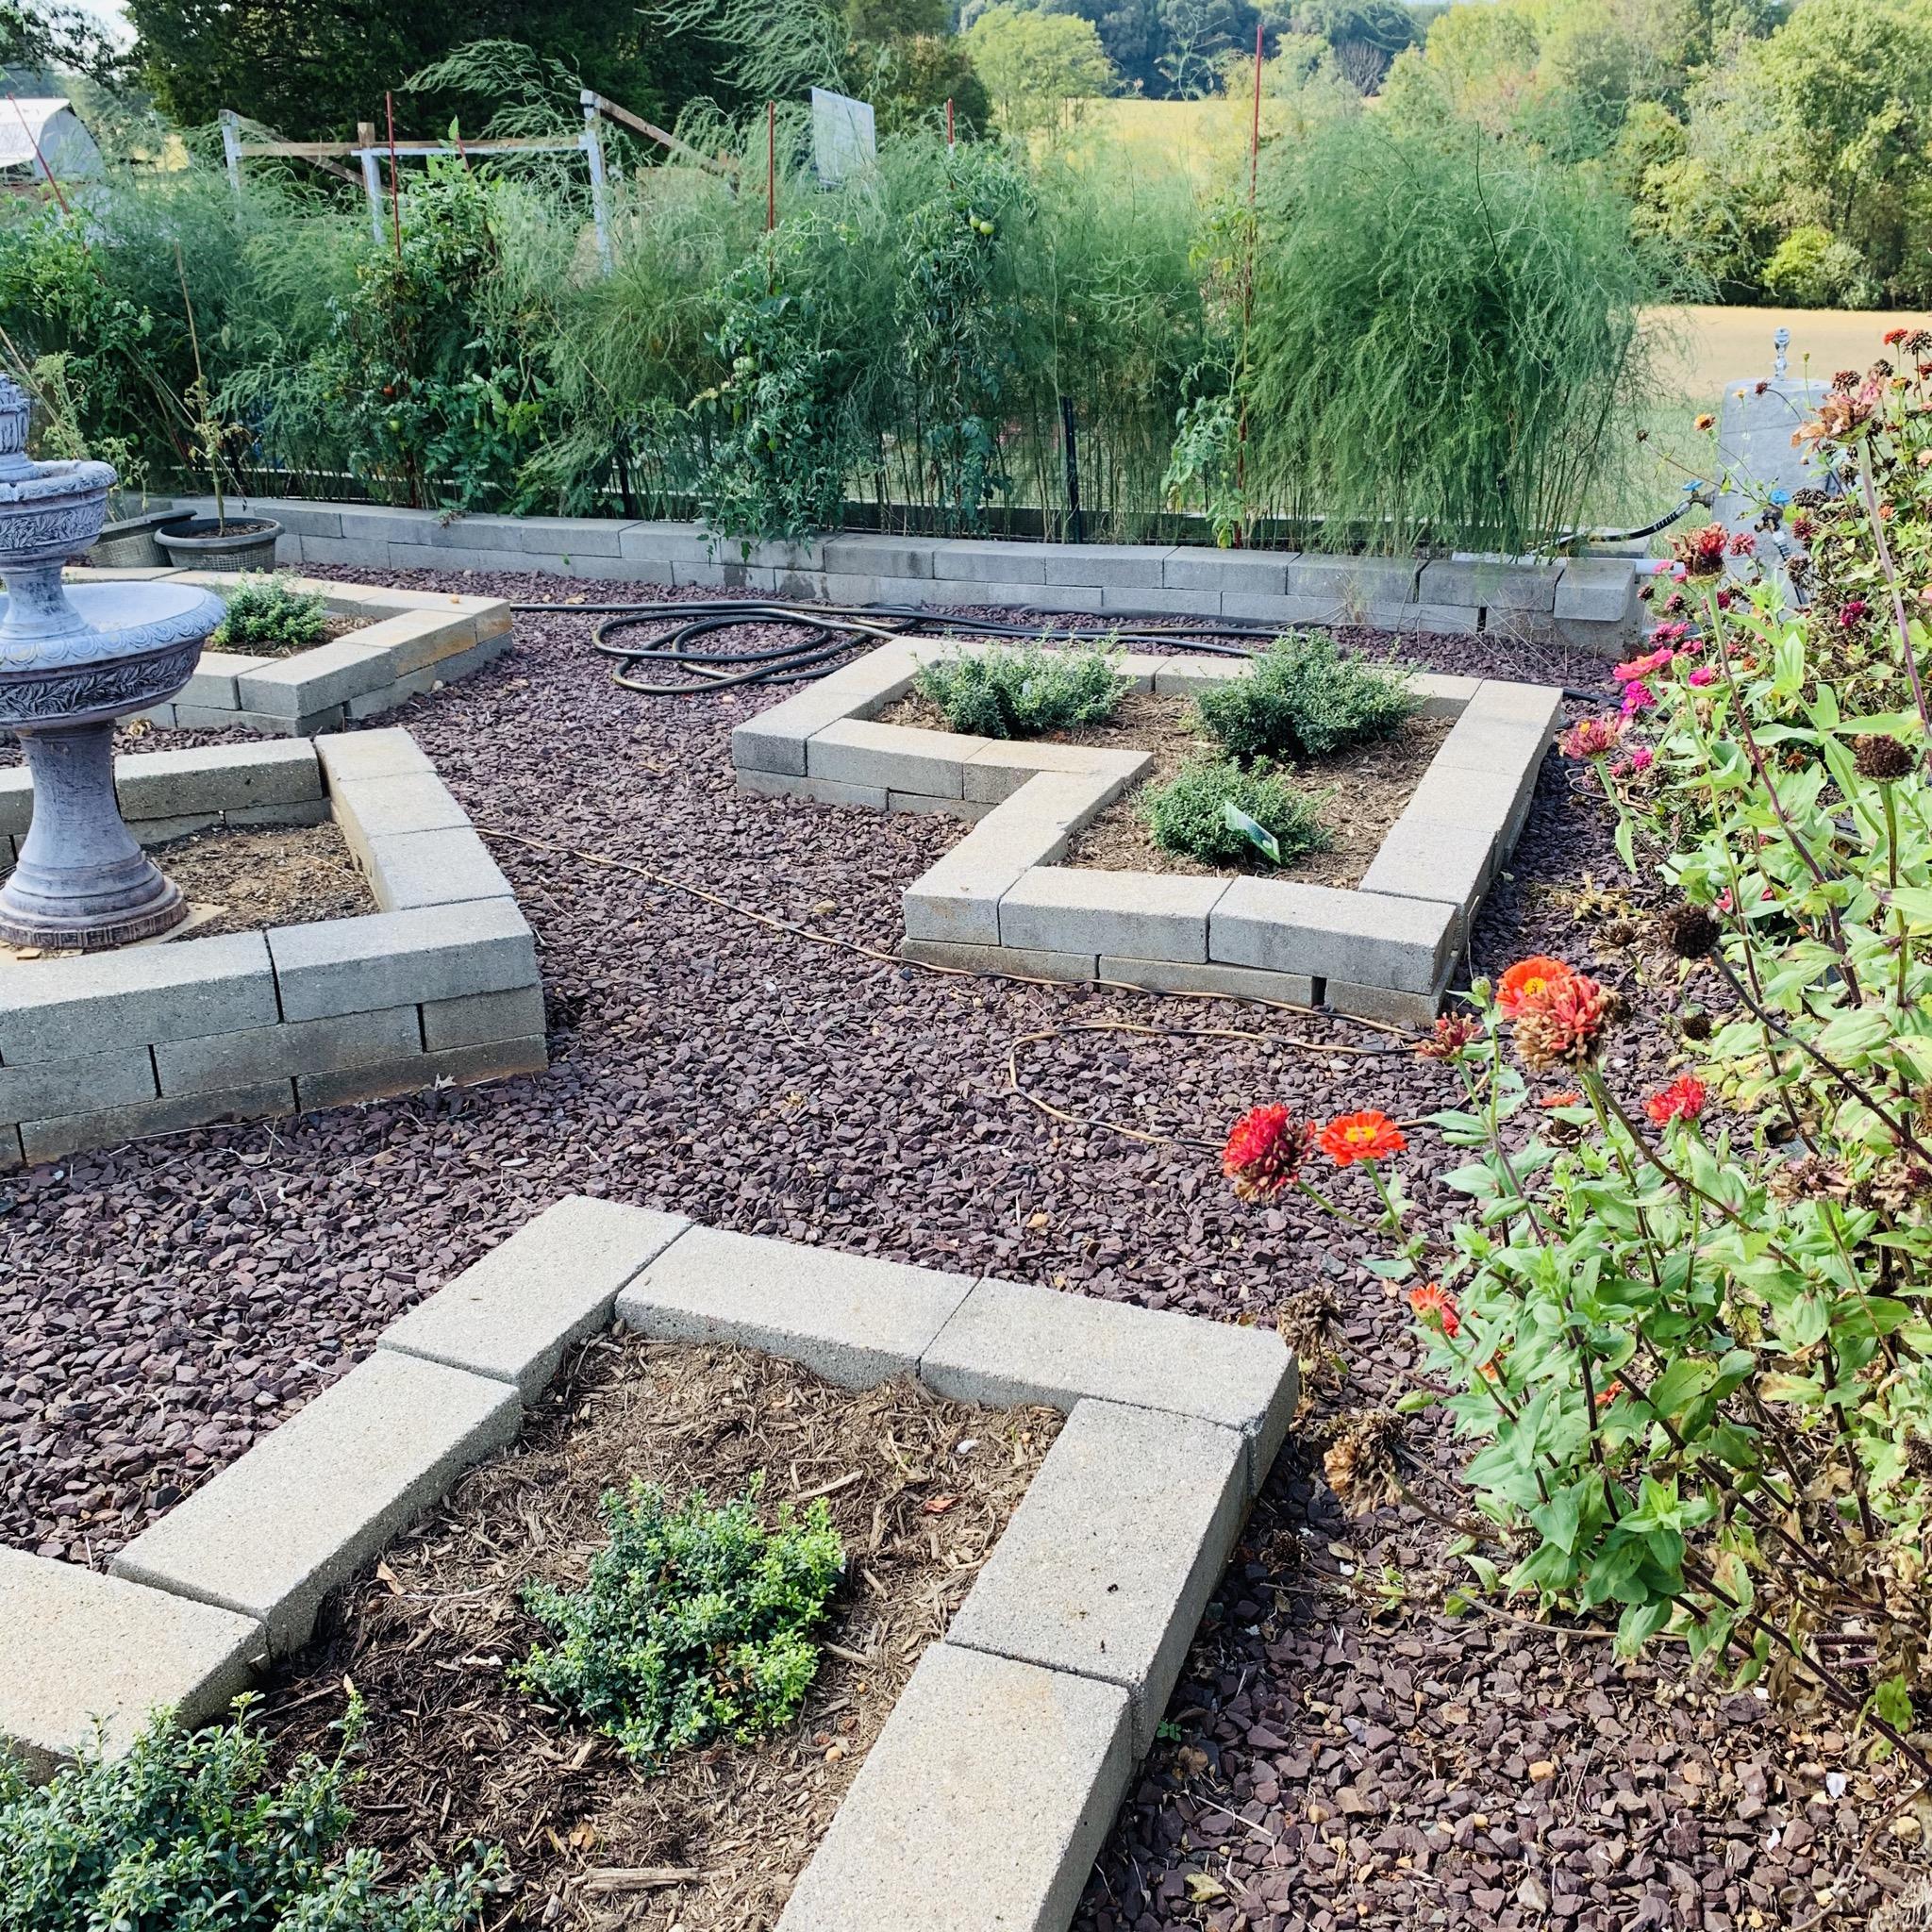 9513AF10 ED7E 4876 AB57 C3A44792B40C The garden is still producing